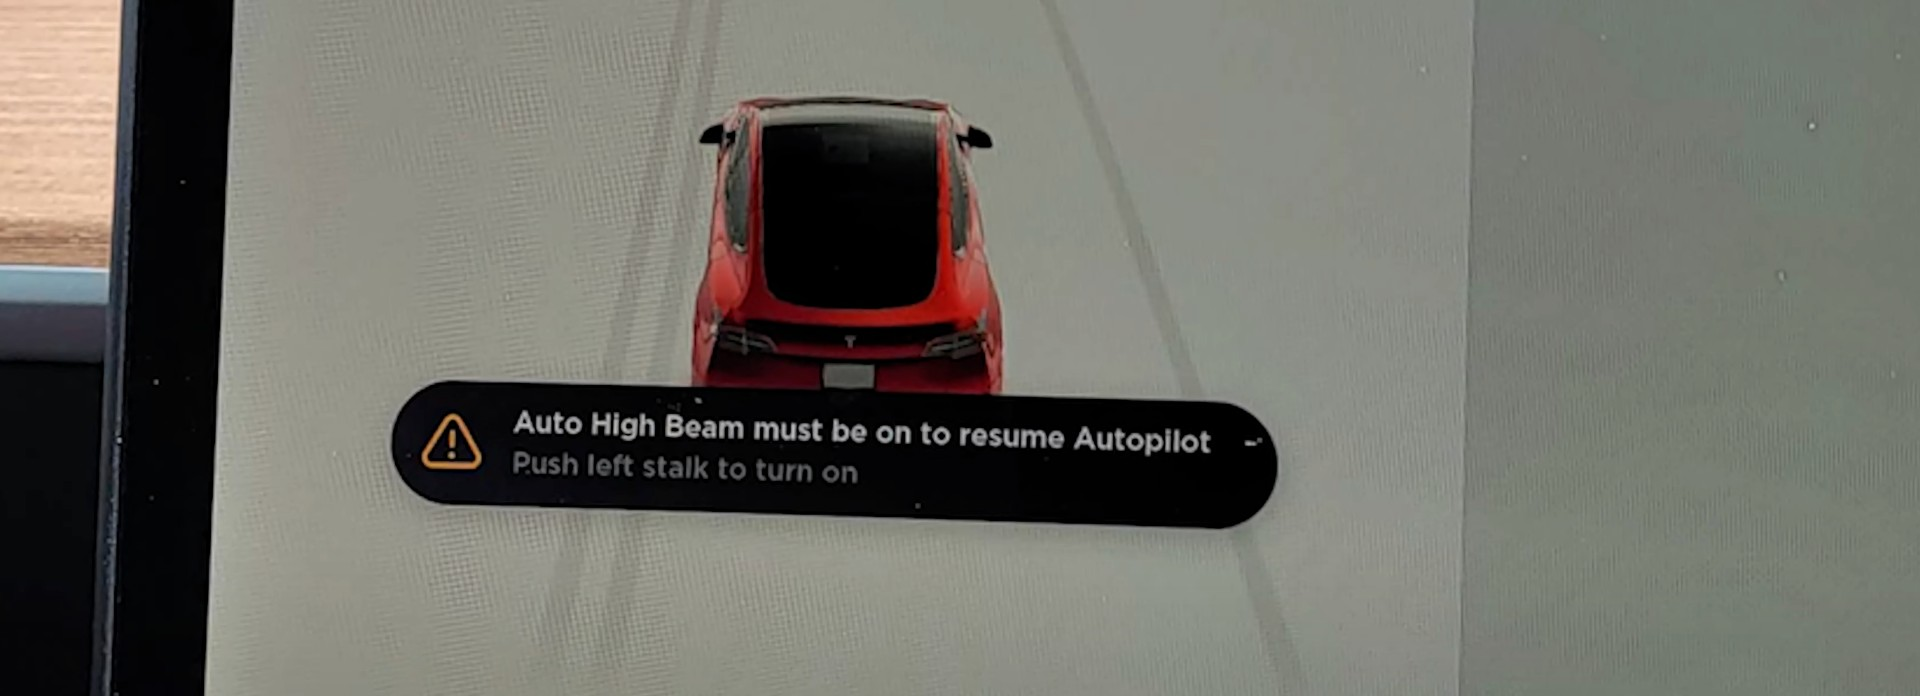 tesla-vision-auto-high-beam-autopilot